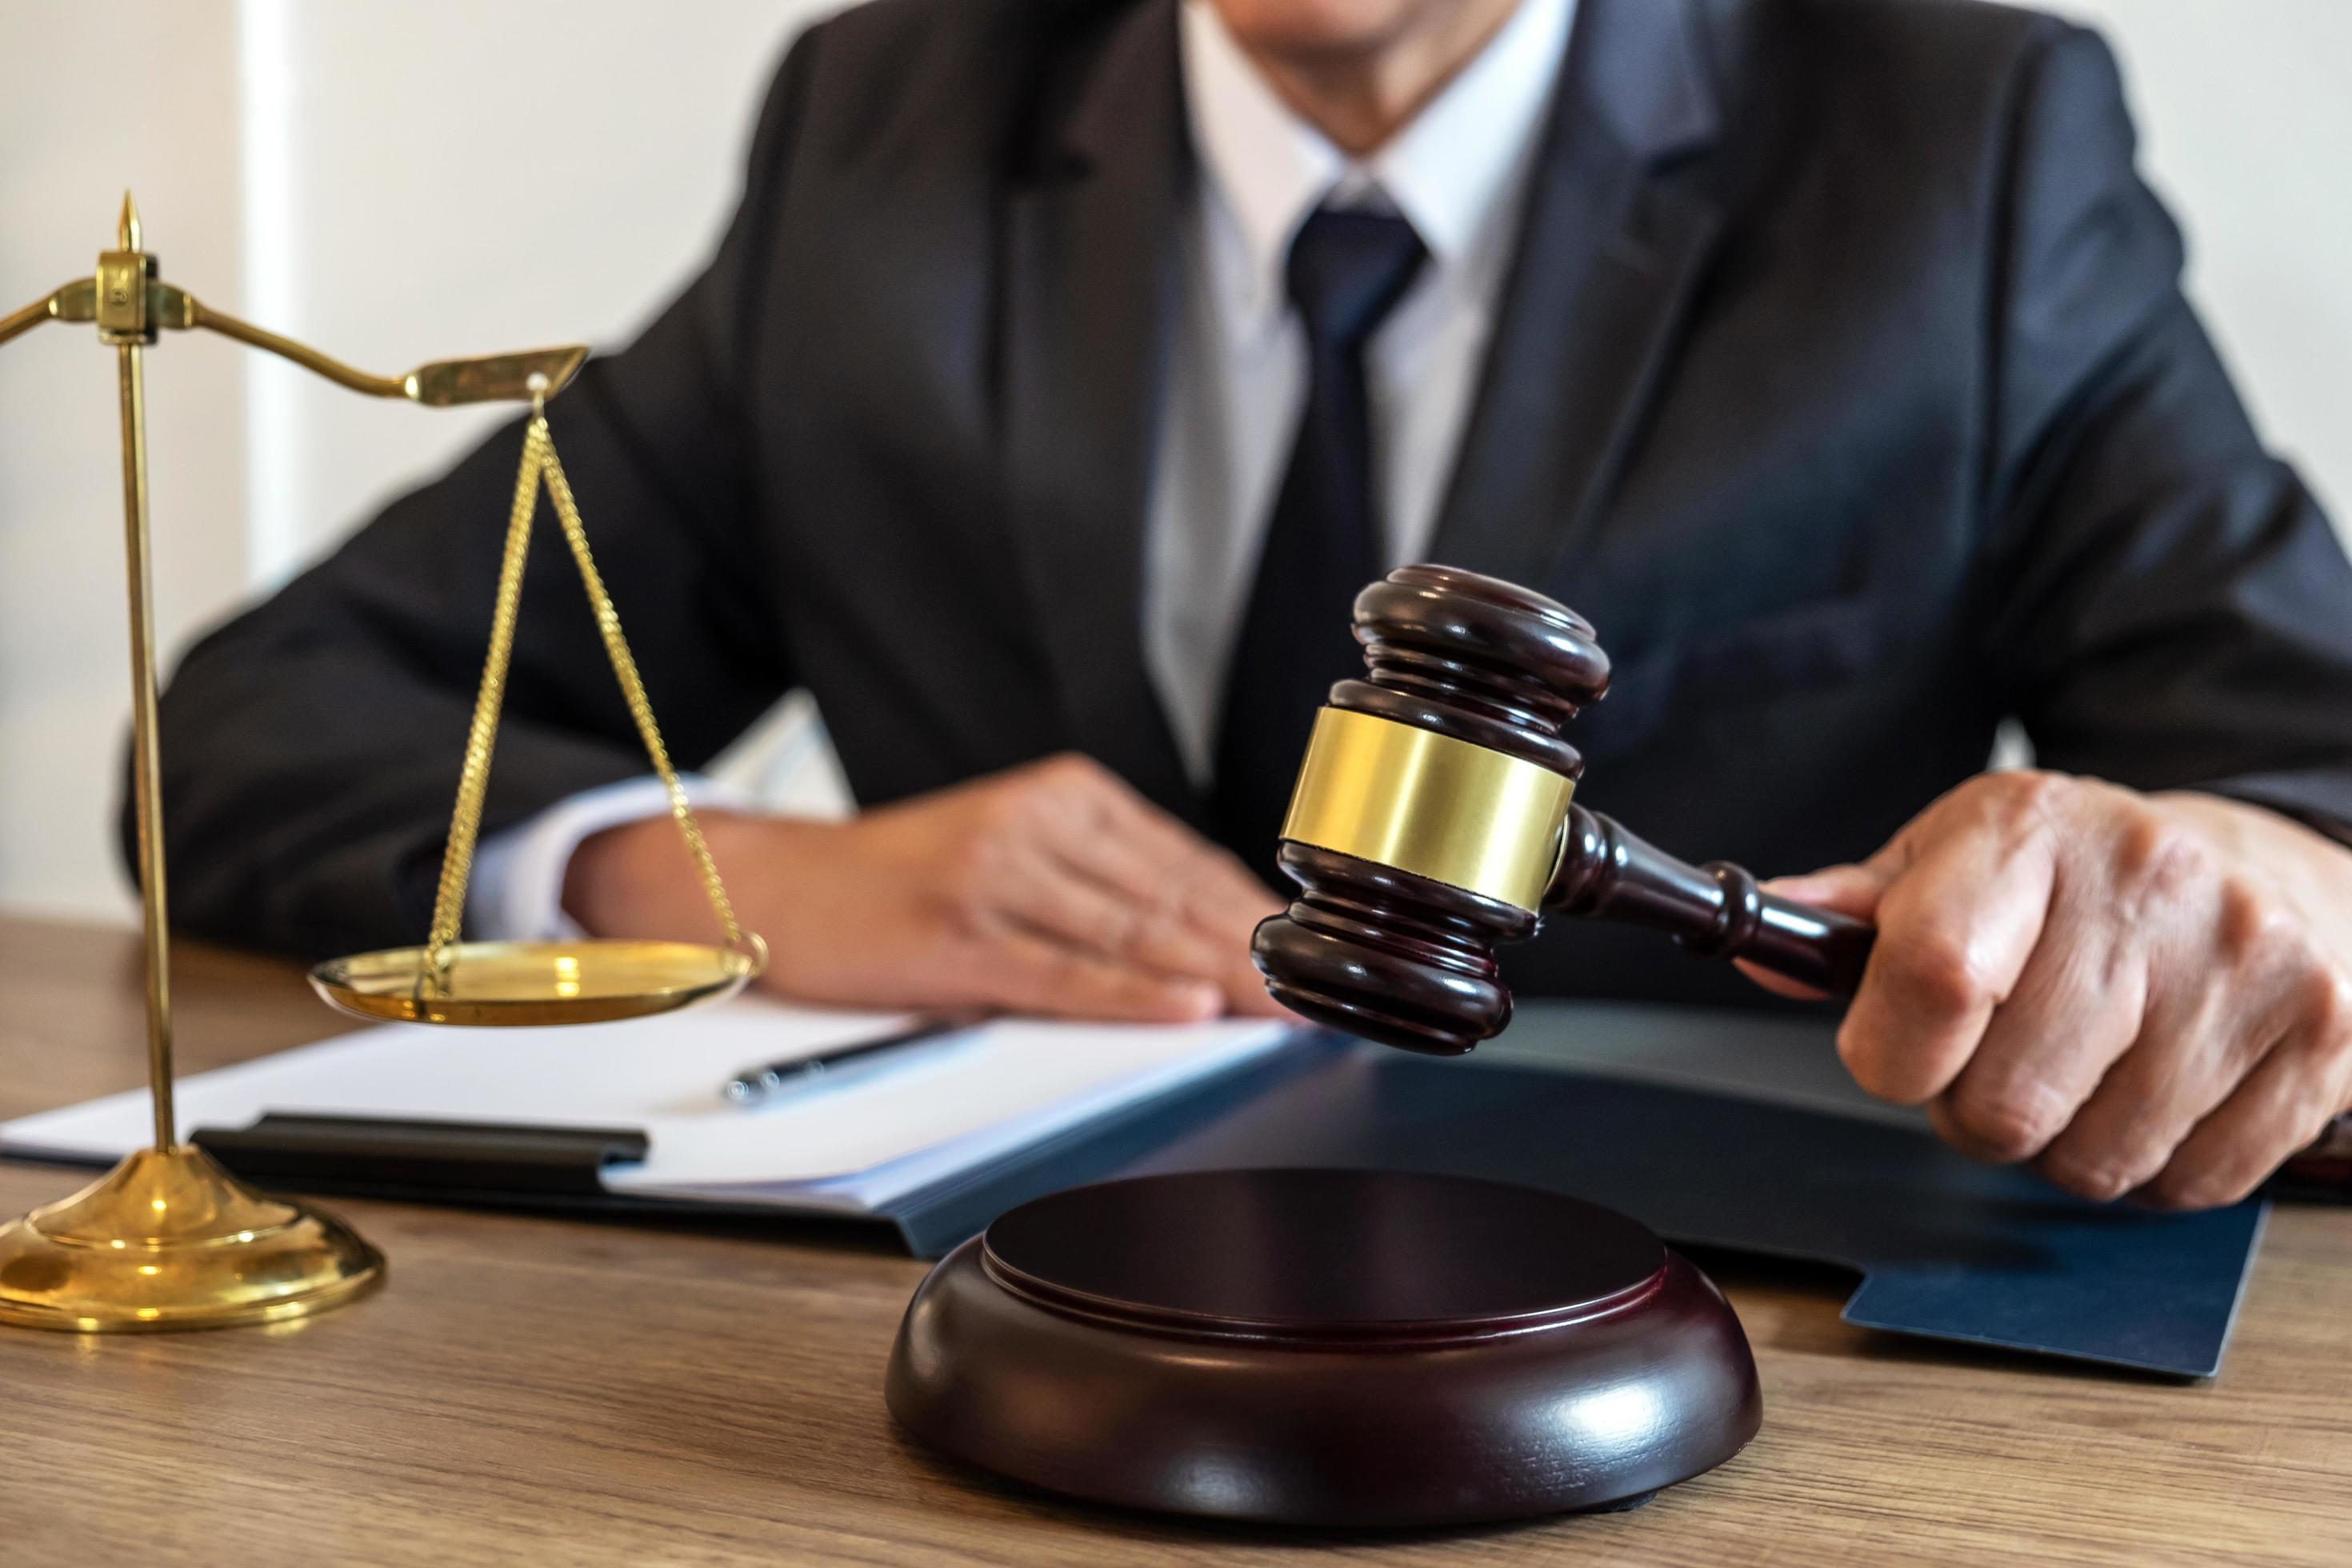 Judge banging gavel on table Stock Photo